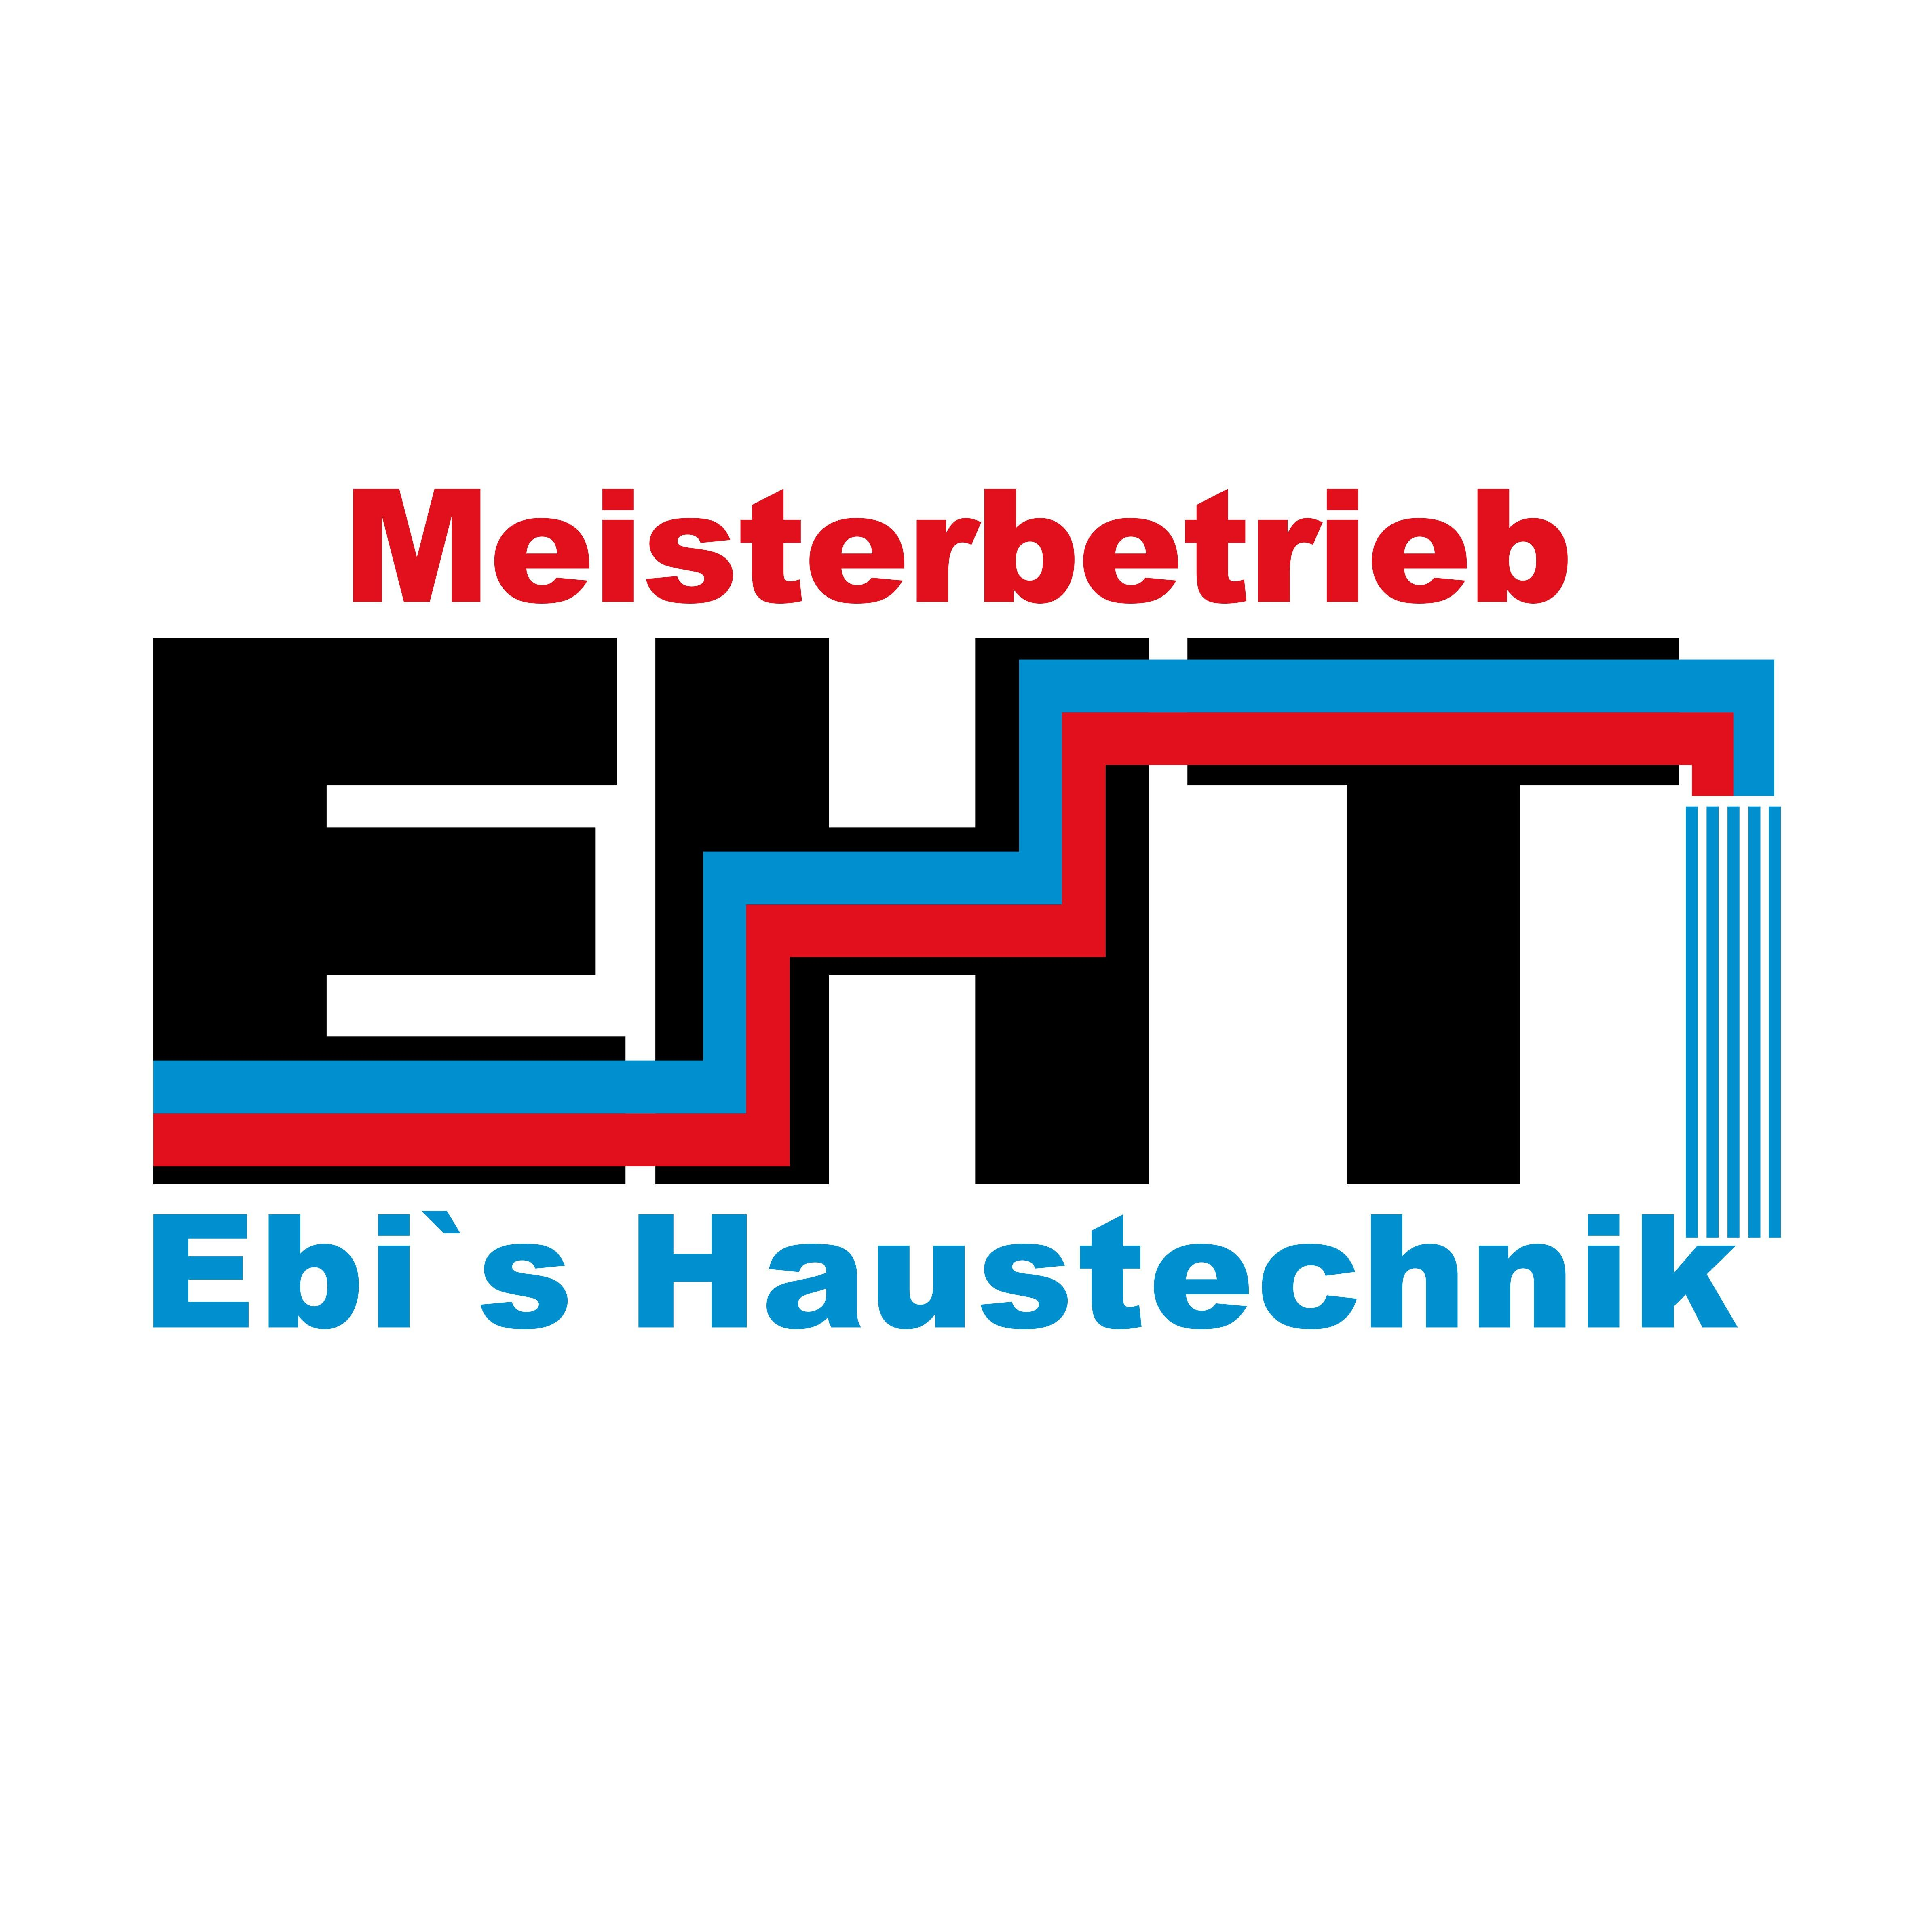 Bild zu Heizung Sanitär Köln Ebi's Haustechnik in Köln